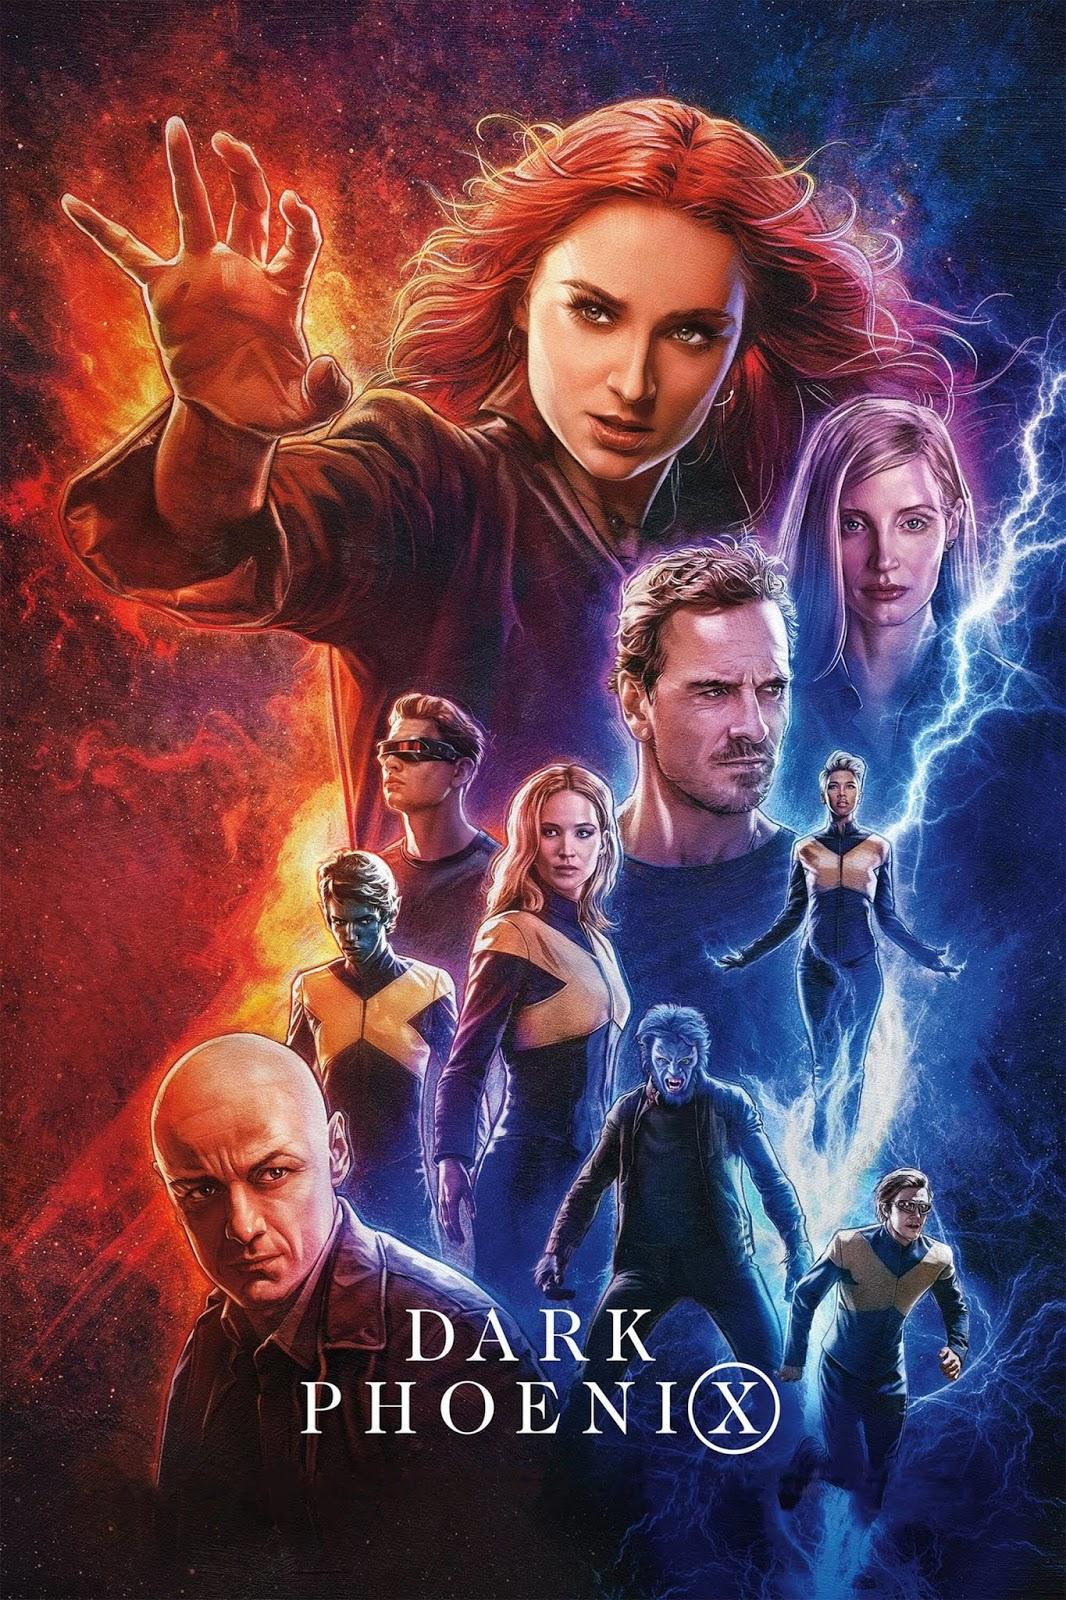 X MEN DARK PHOENIX (2019) MOVIE TAMIL DUBBED HD